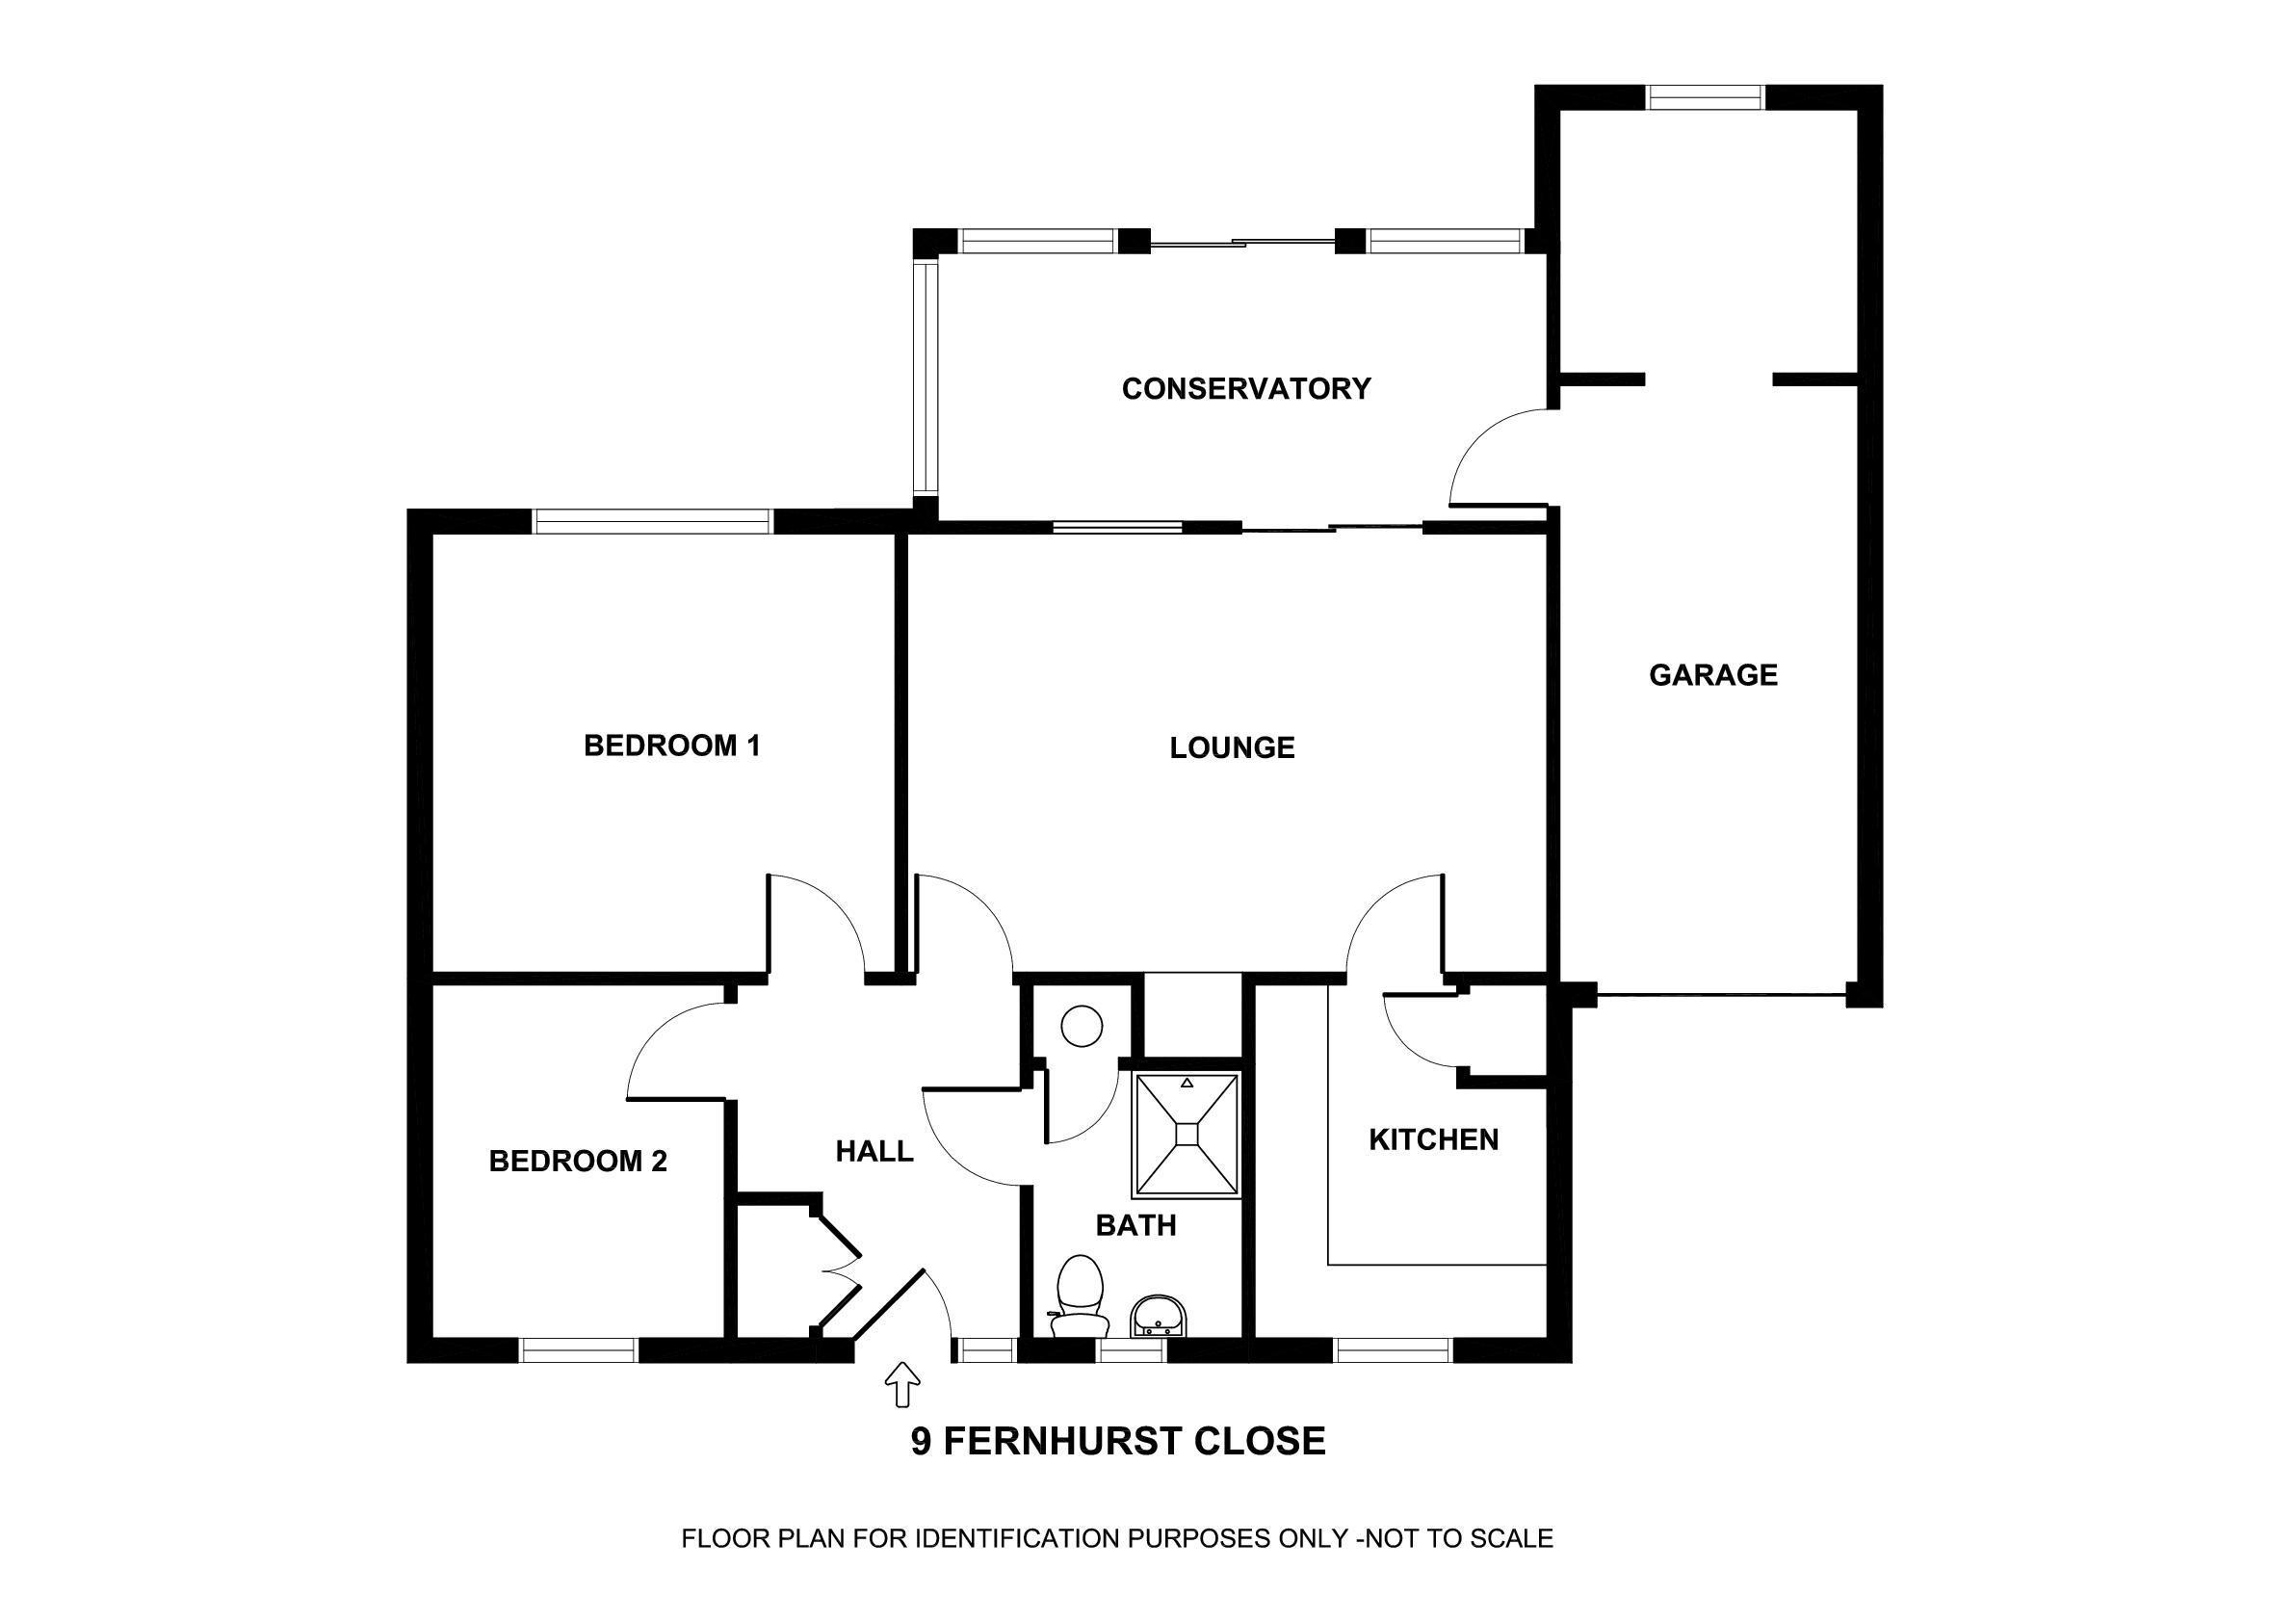 Fernhurst Close